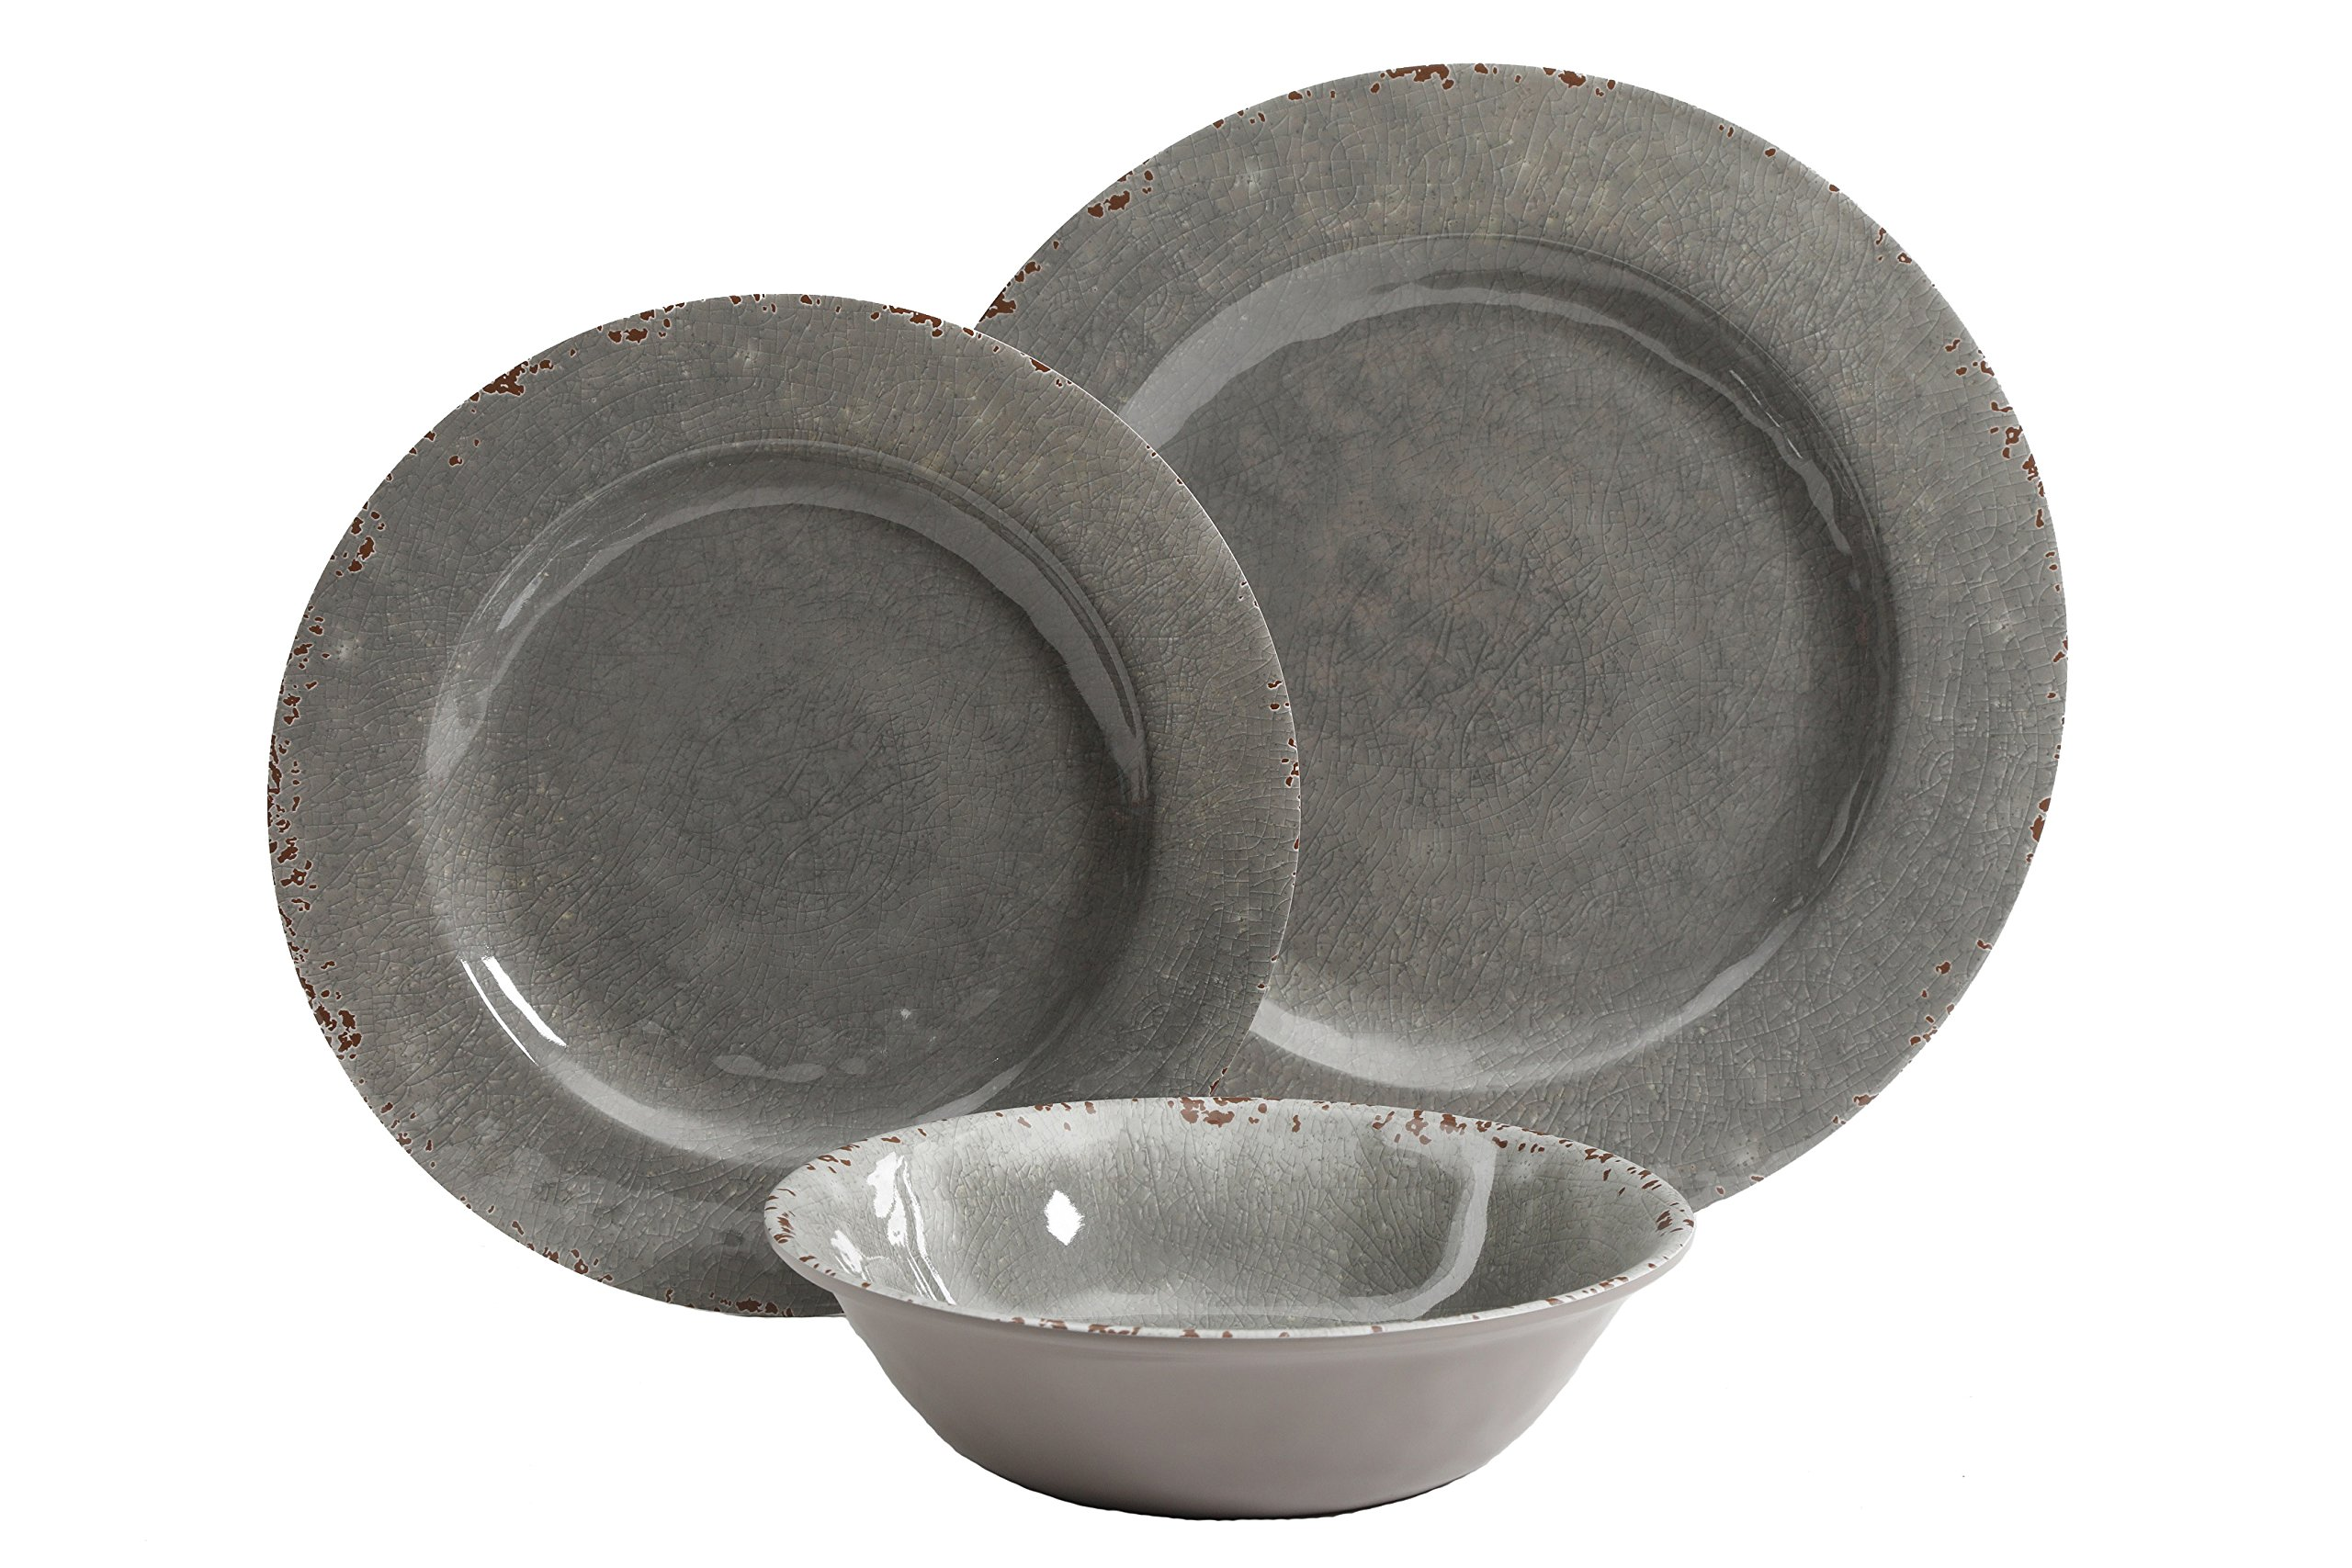 Gibson Studio 12 Piece Mauna Melamine Dinnerware Set, Grey Rustic